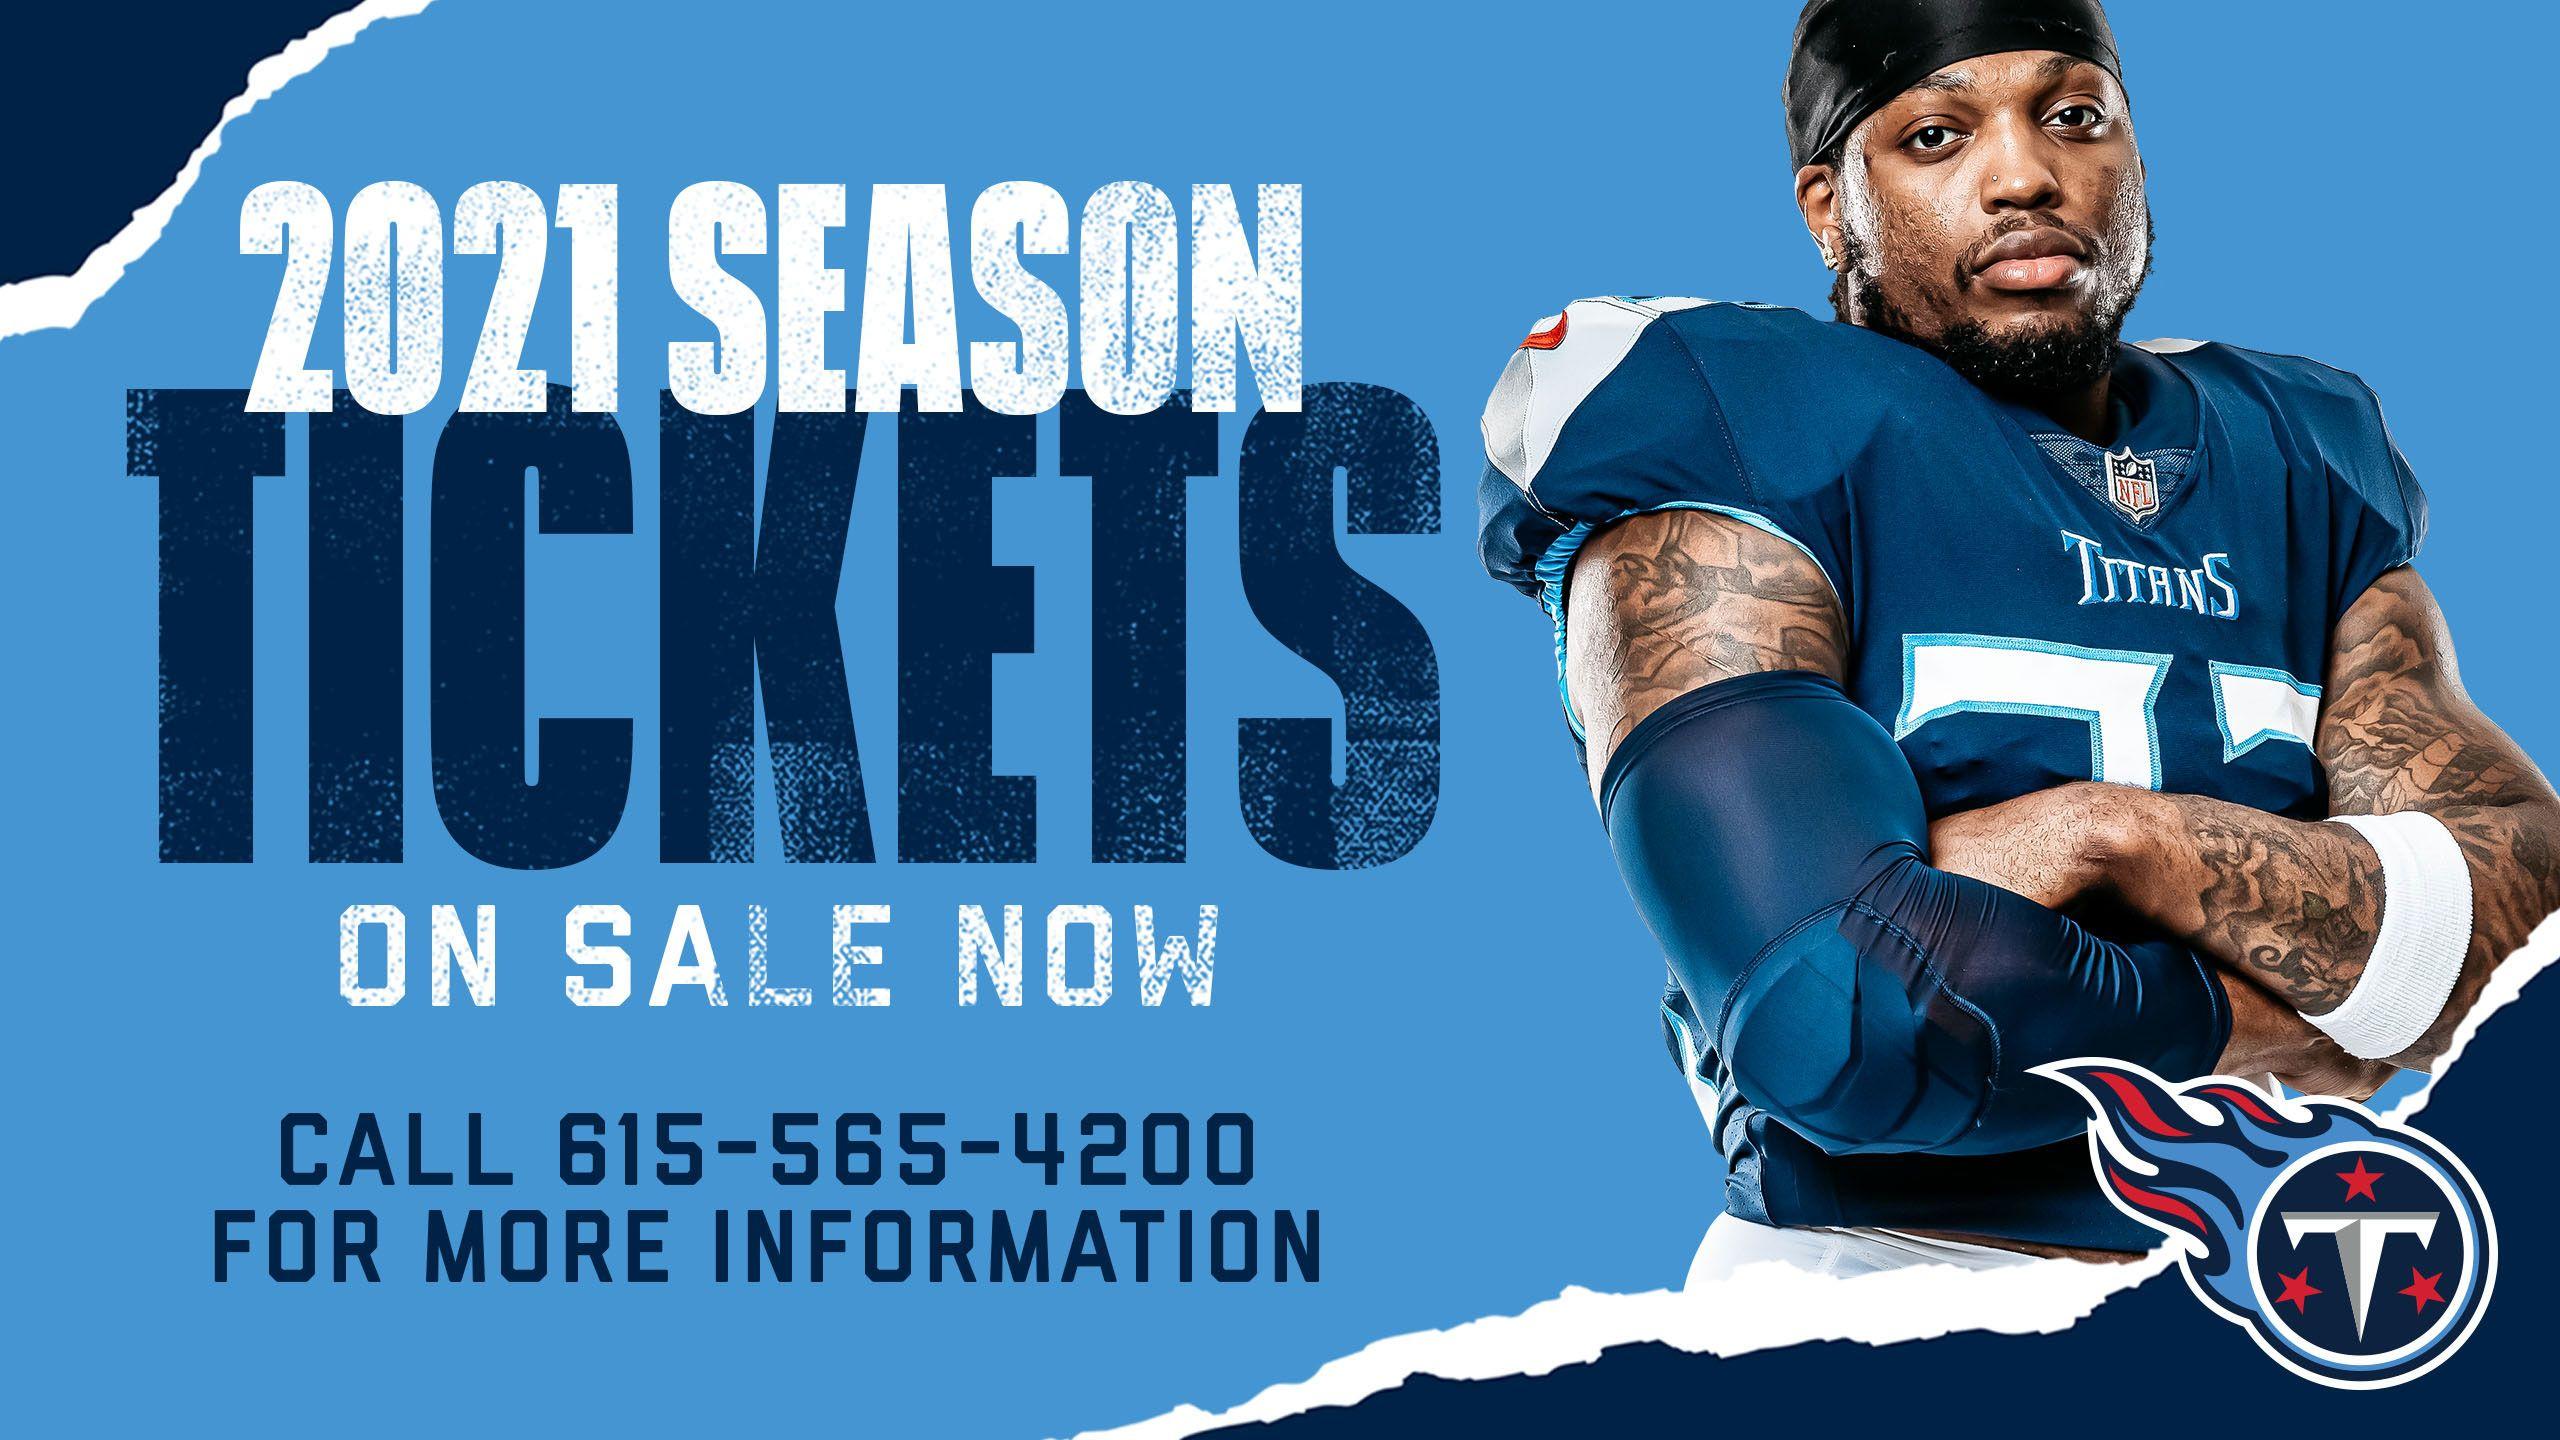 2021-season-tickets2560x1440